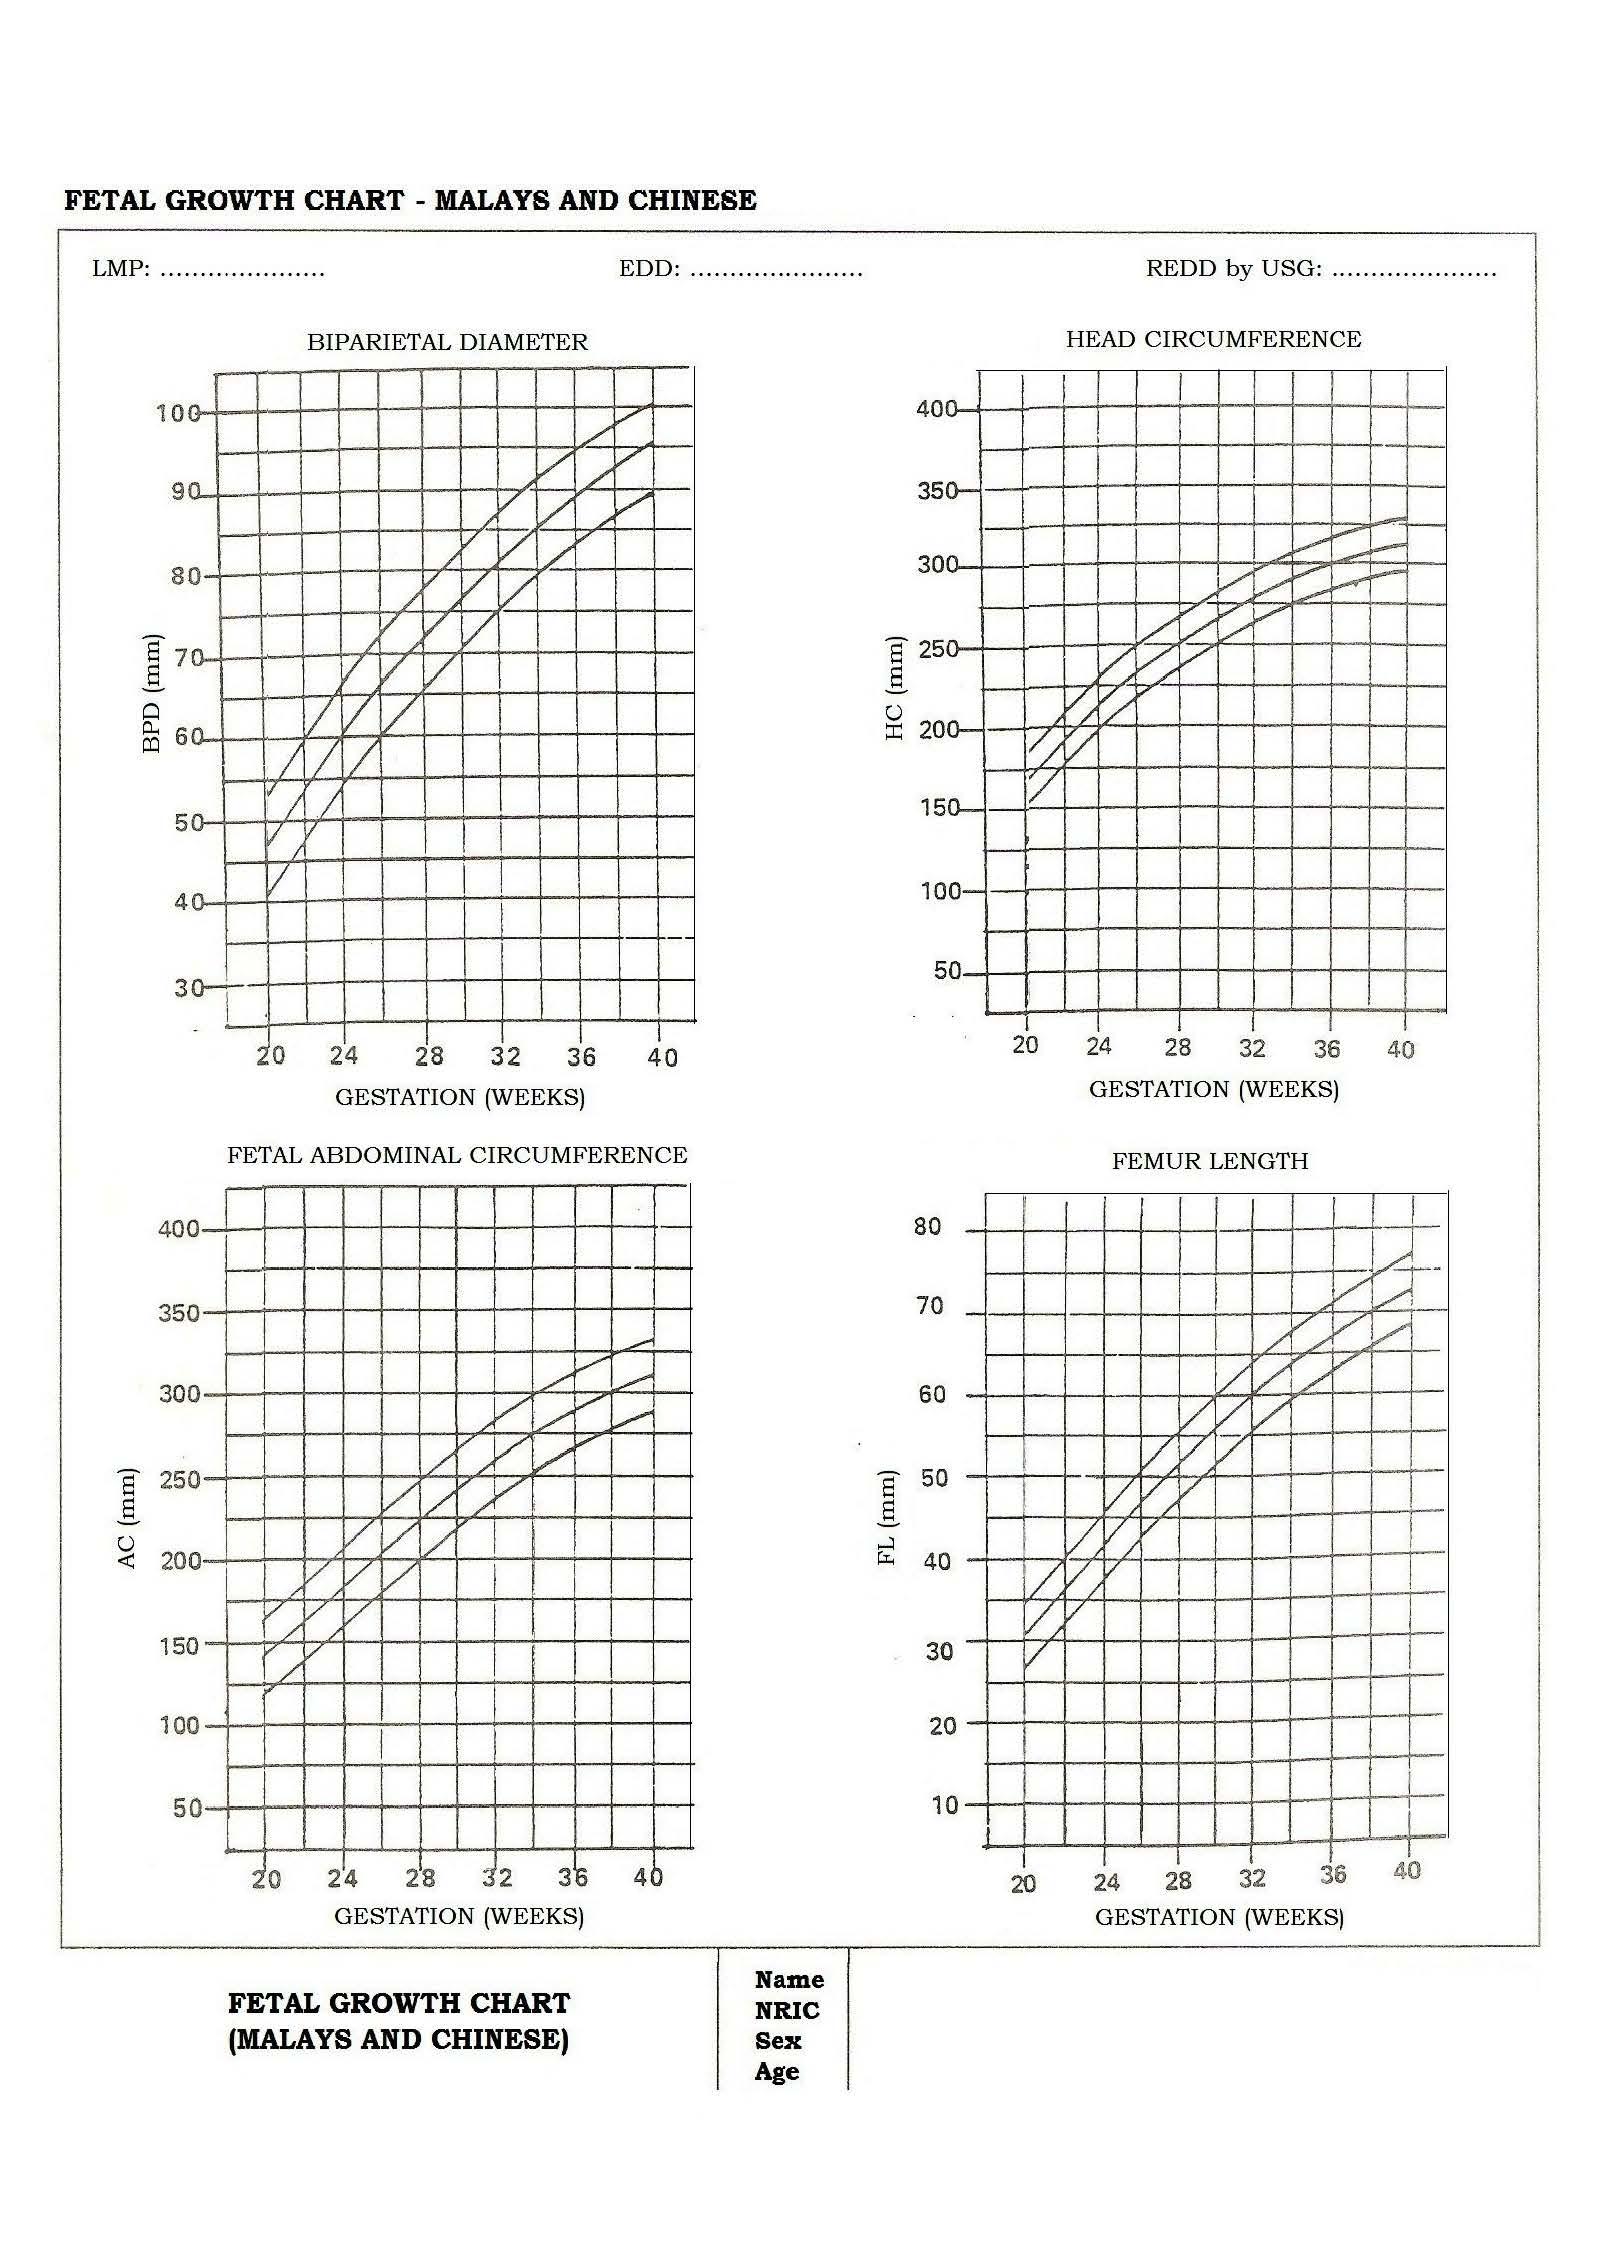 Ultrasound documentation and growth chart og sgh usg singletonpage1 usg twinspage1 usg twinspage2 nvjuhfo Choice Image